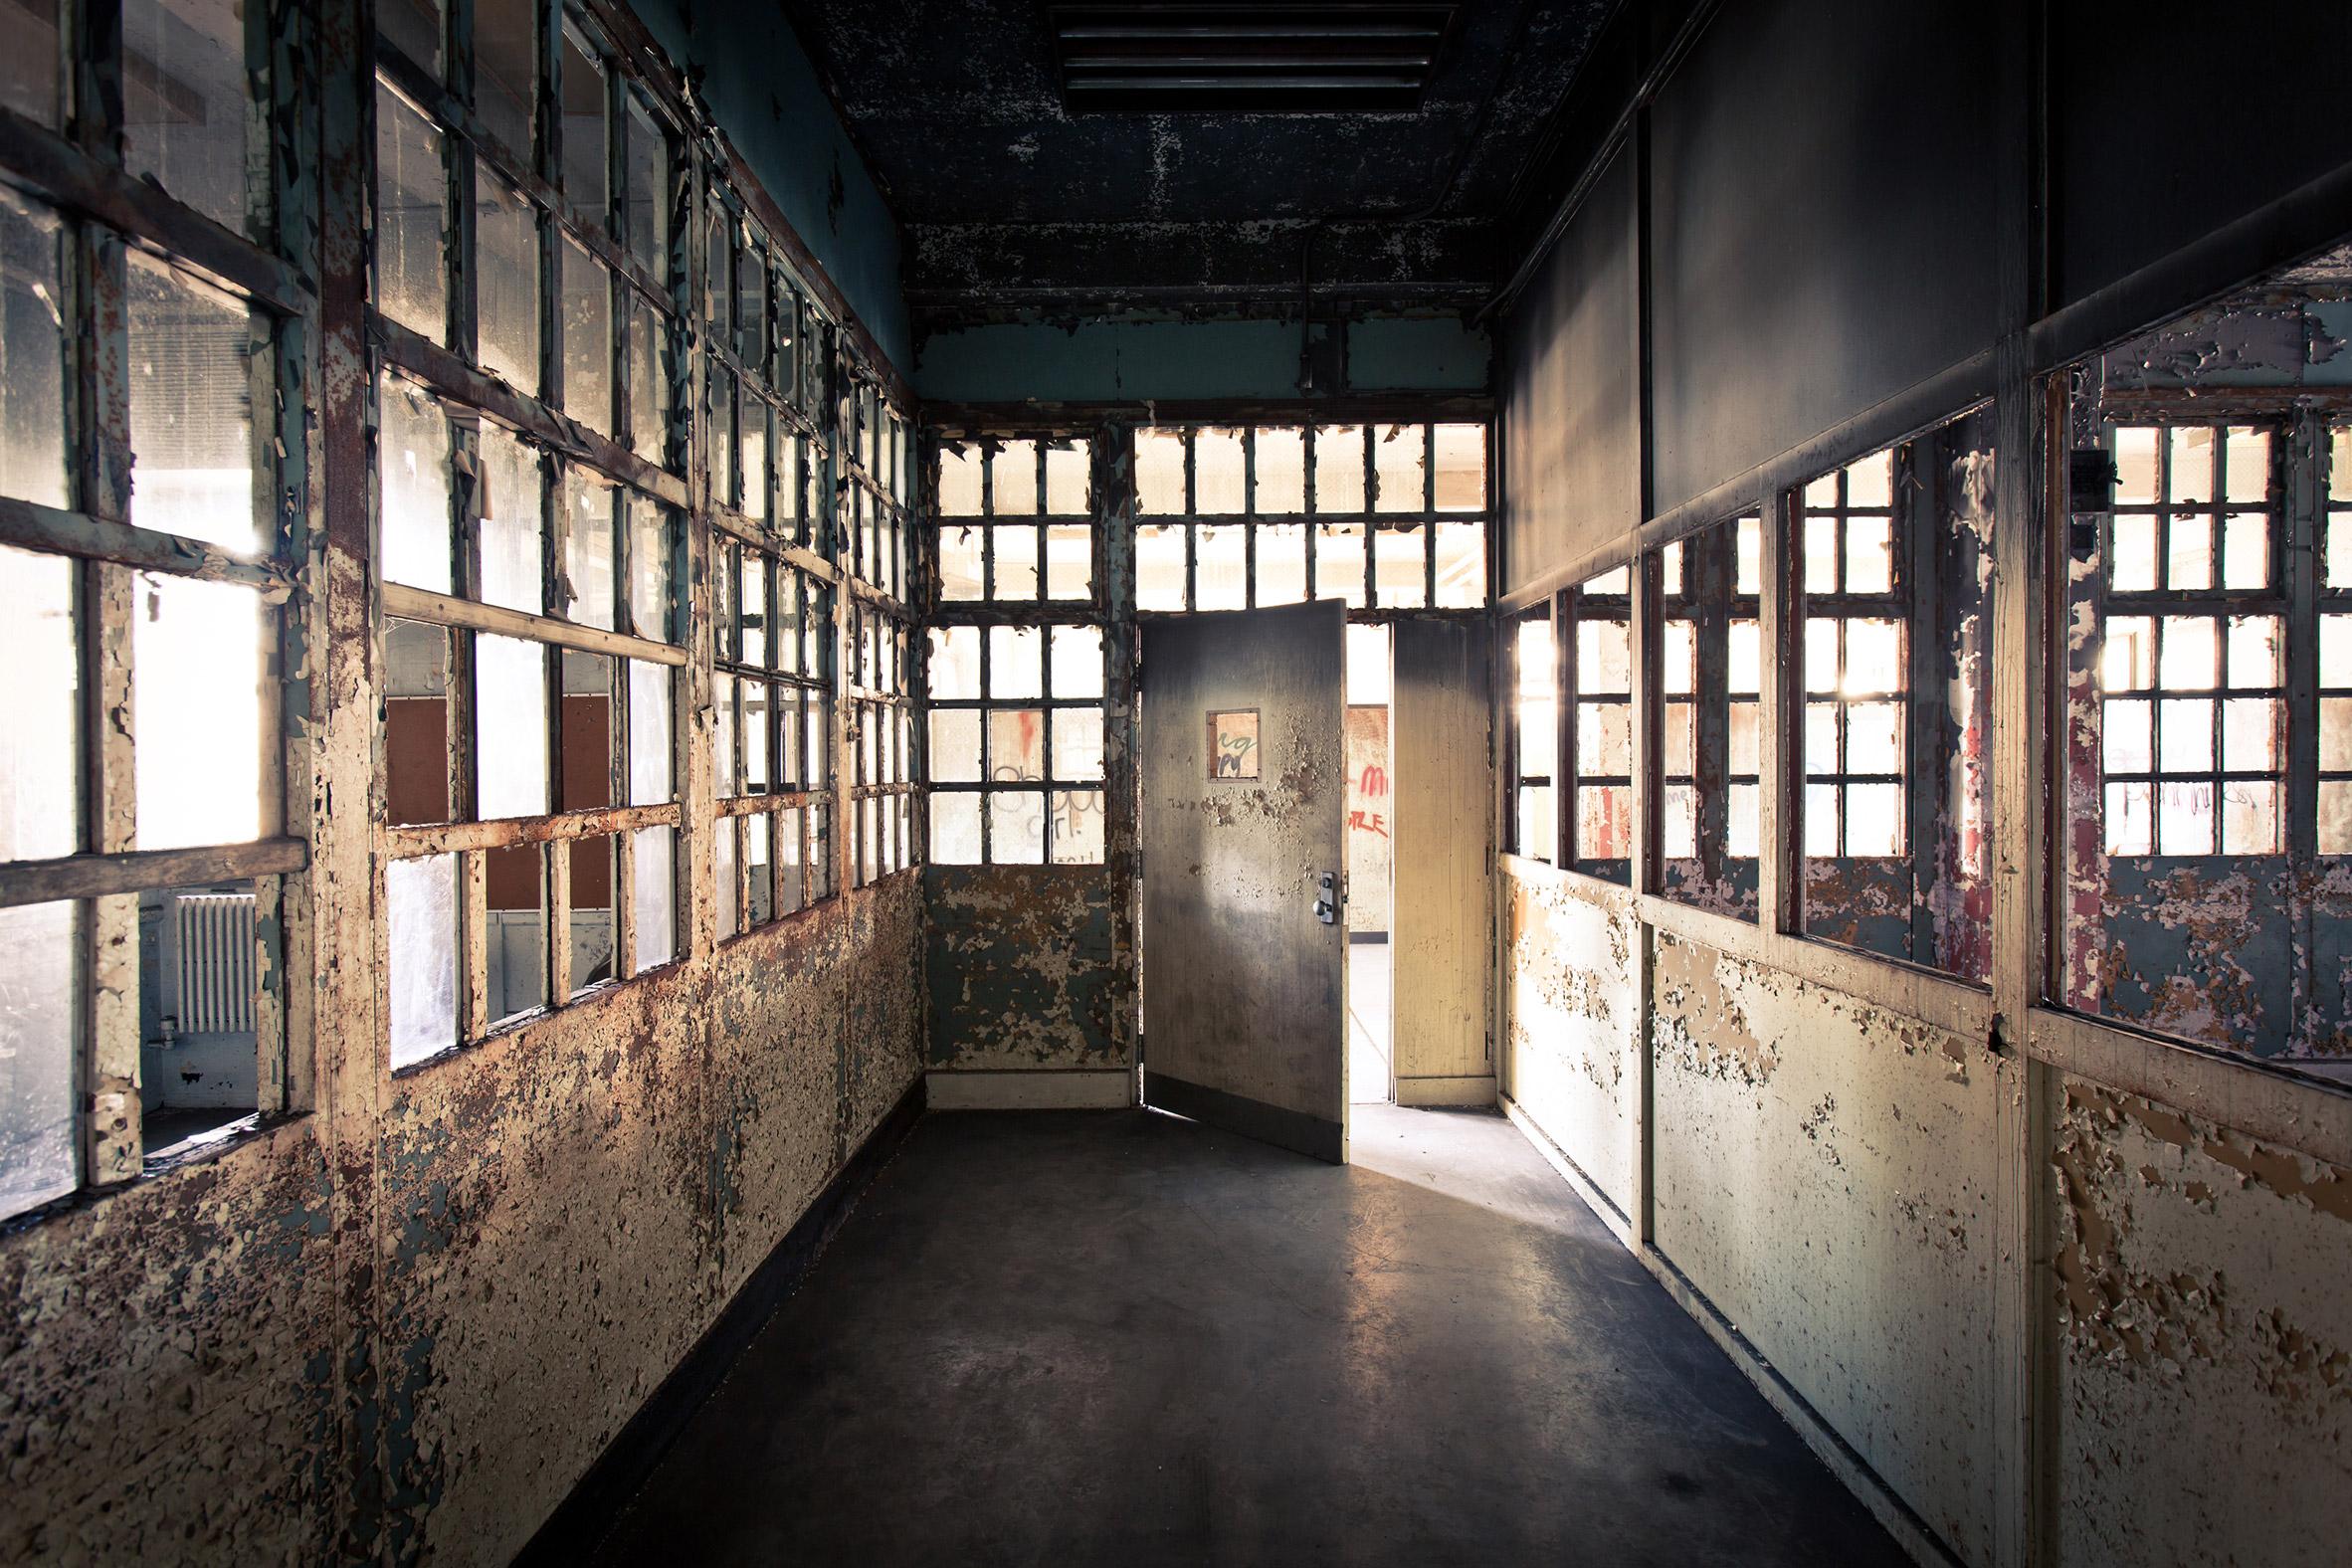 Abandoned-Asylums-12.jpg